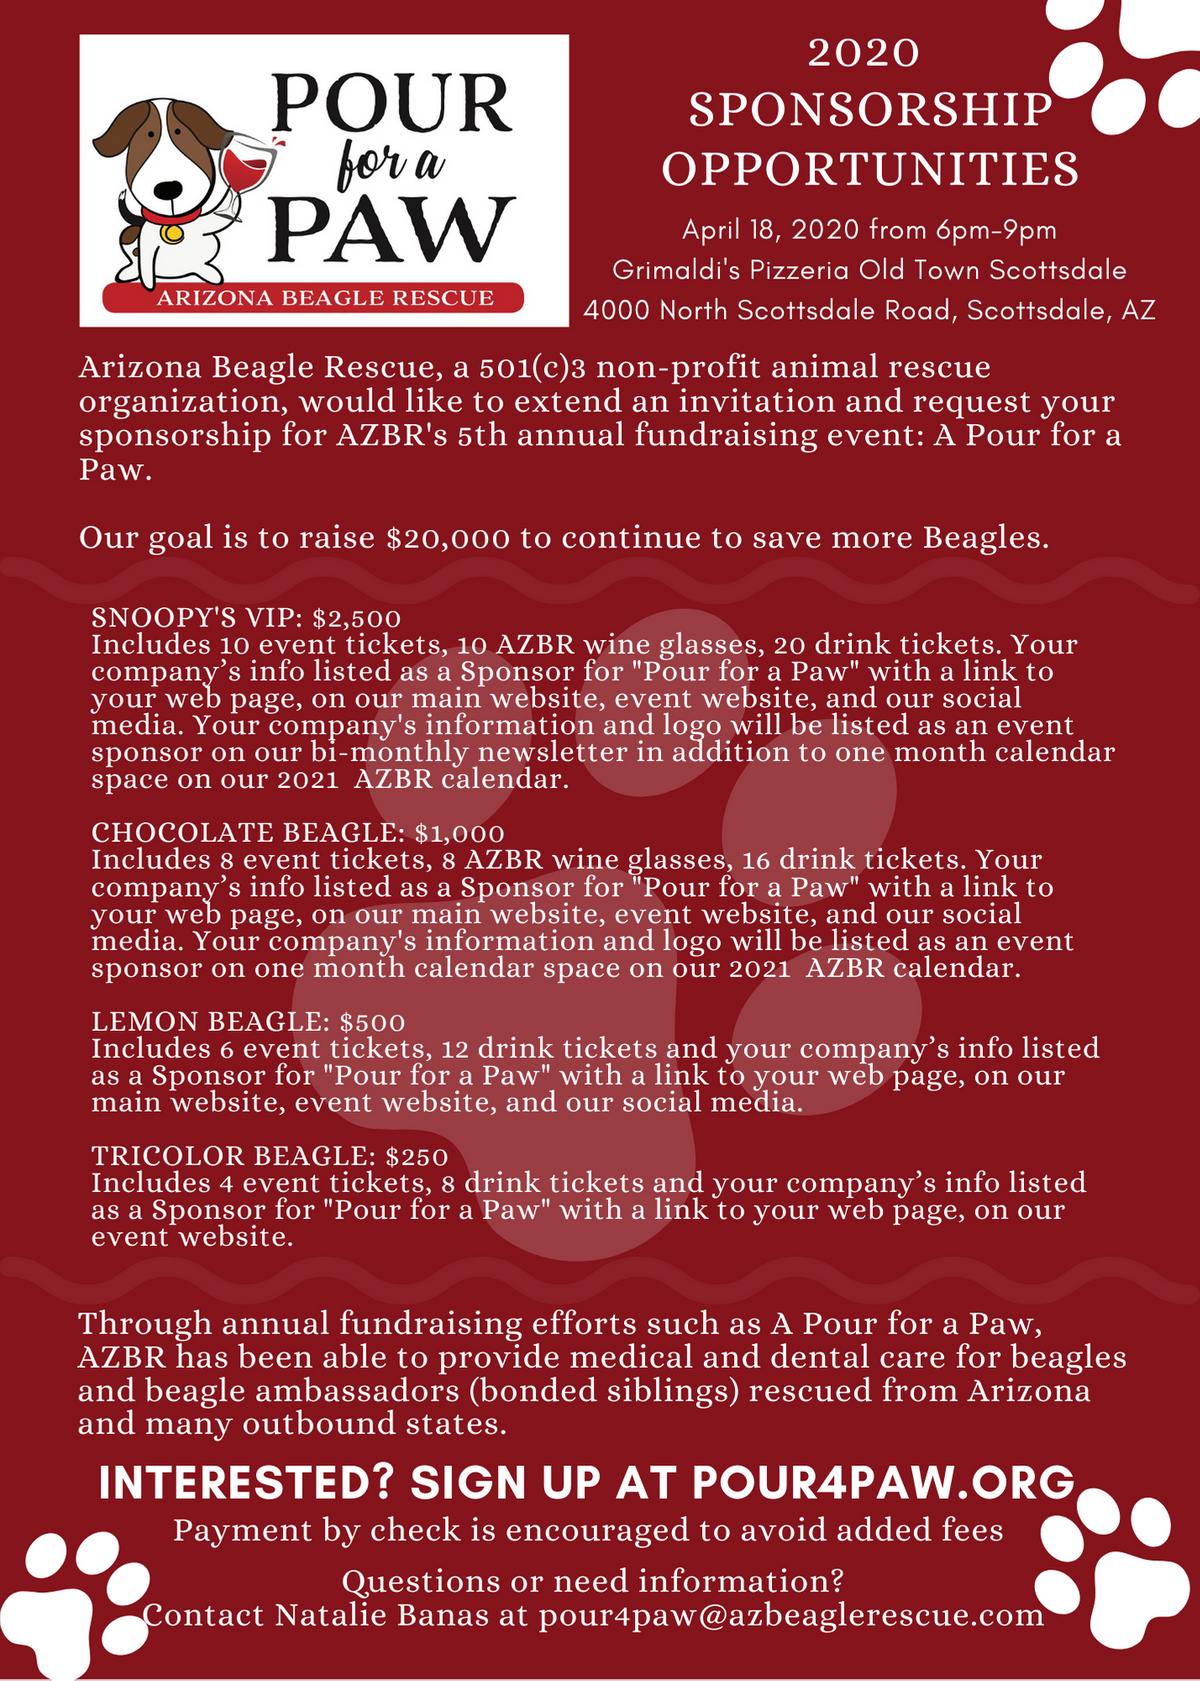 PourForaPaw 2020 Sponsorship Invitation (online image distribution).png